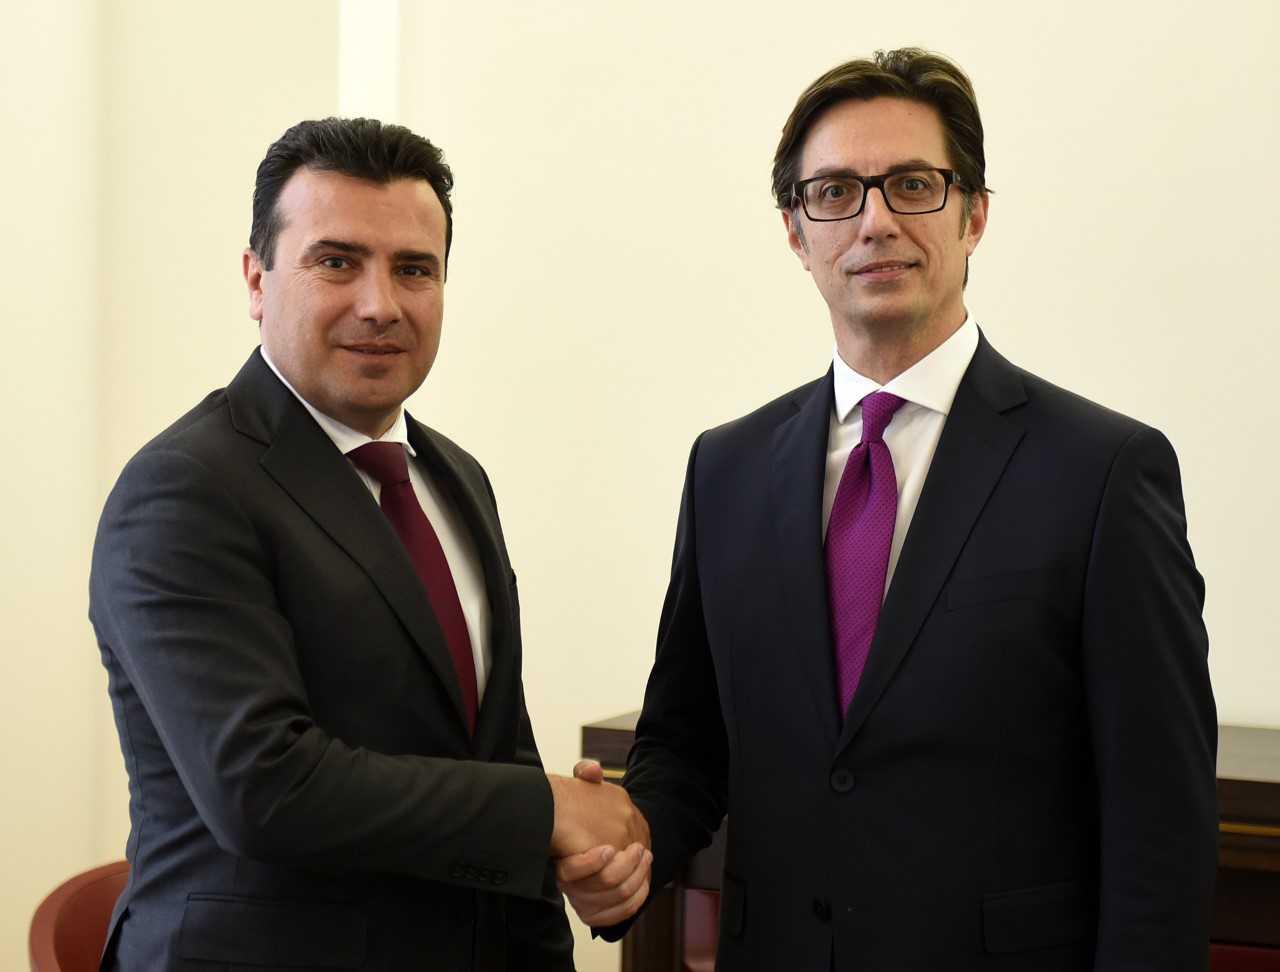 Zaev-Pendarovski, common foreign policy agenda?